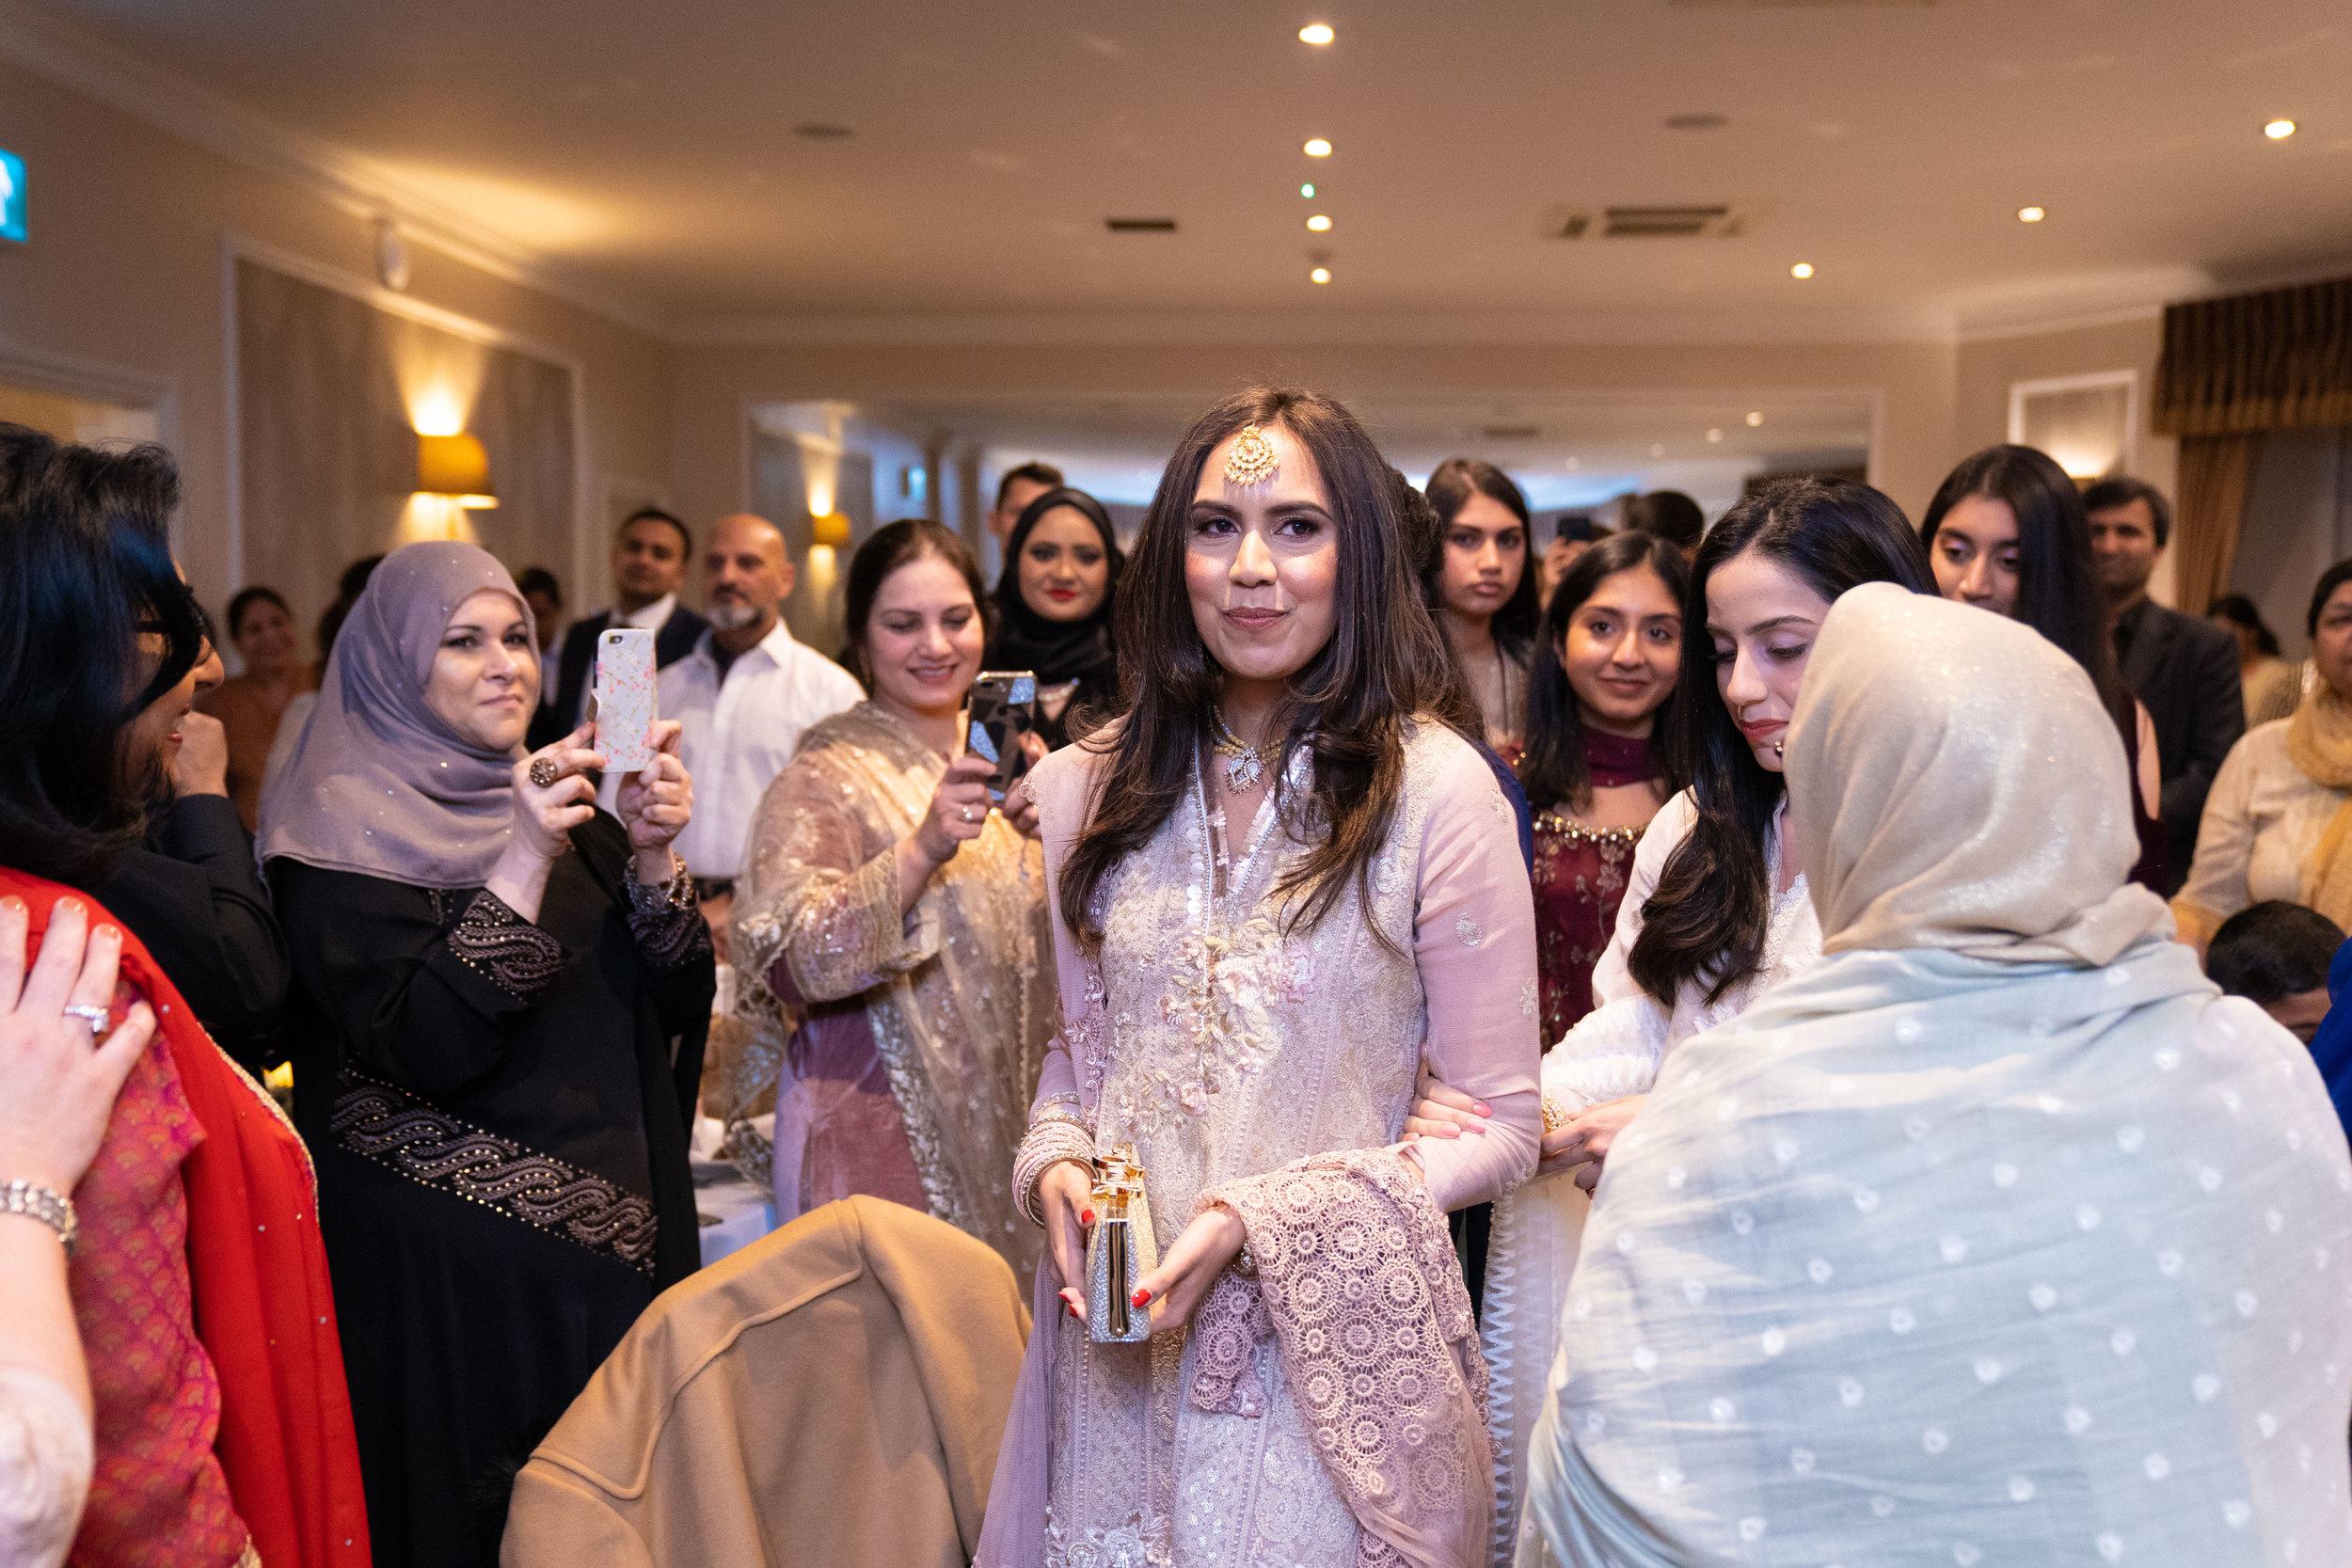 buckinghamshire-golf-club-winter-muslim-wedding-engagement-photography-videography-20